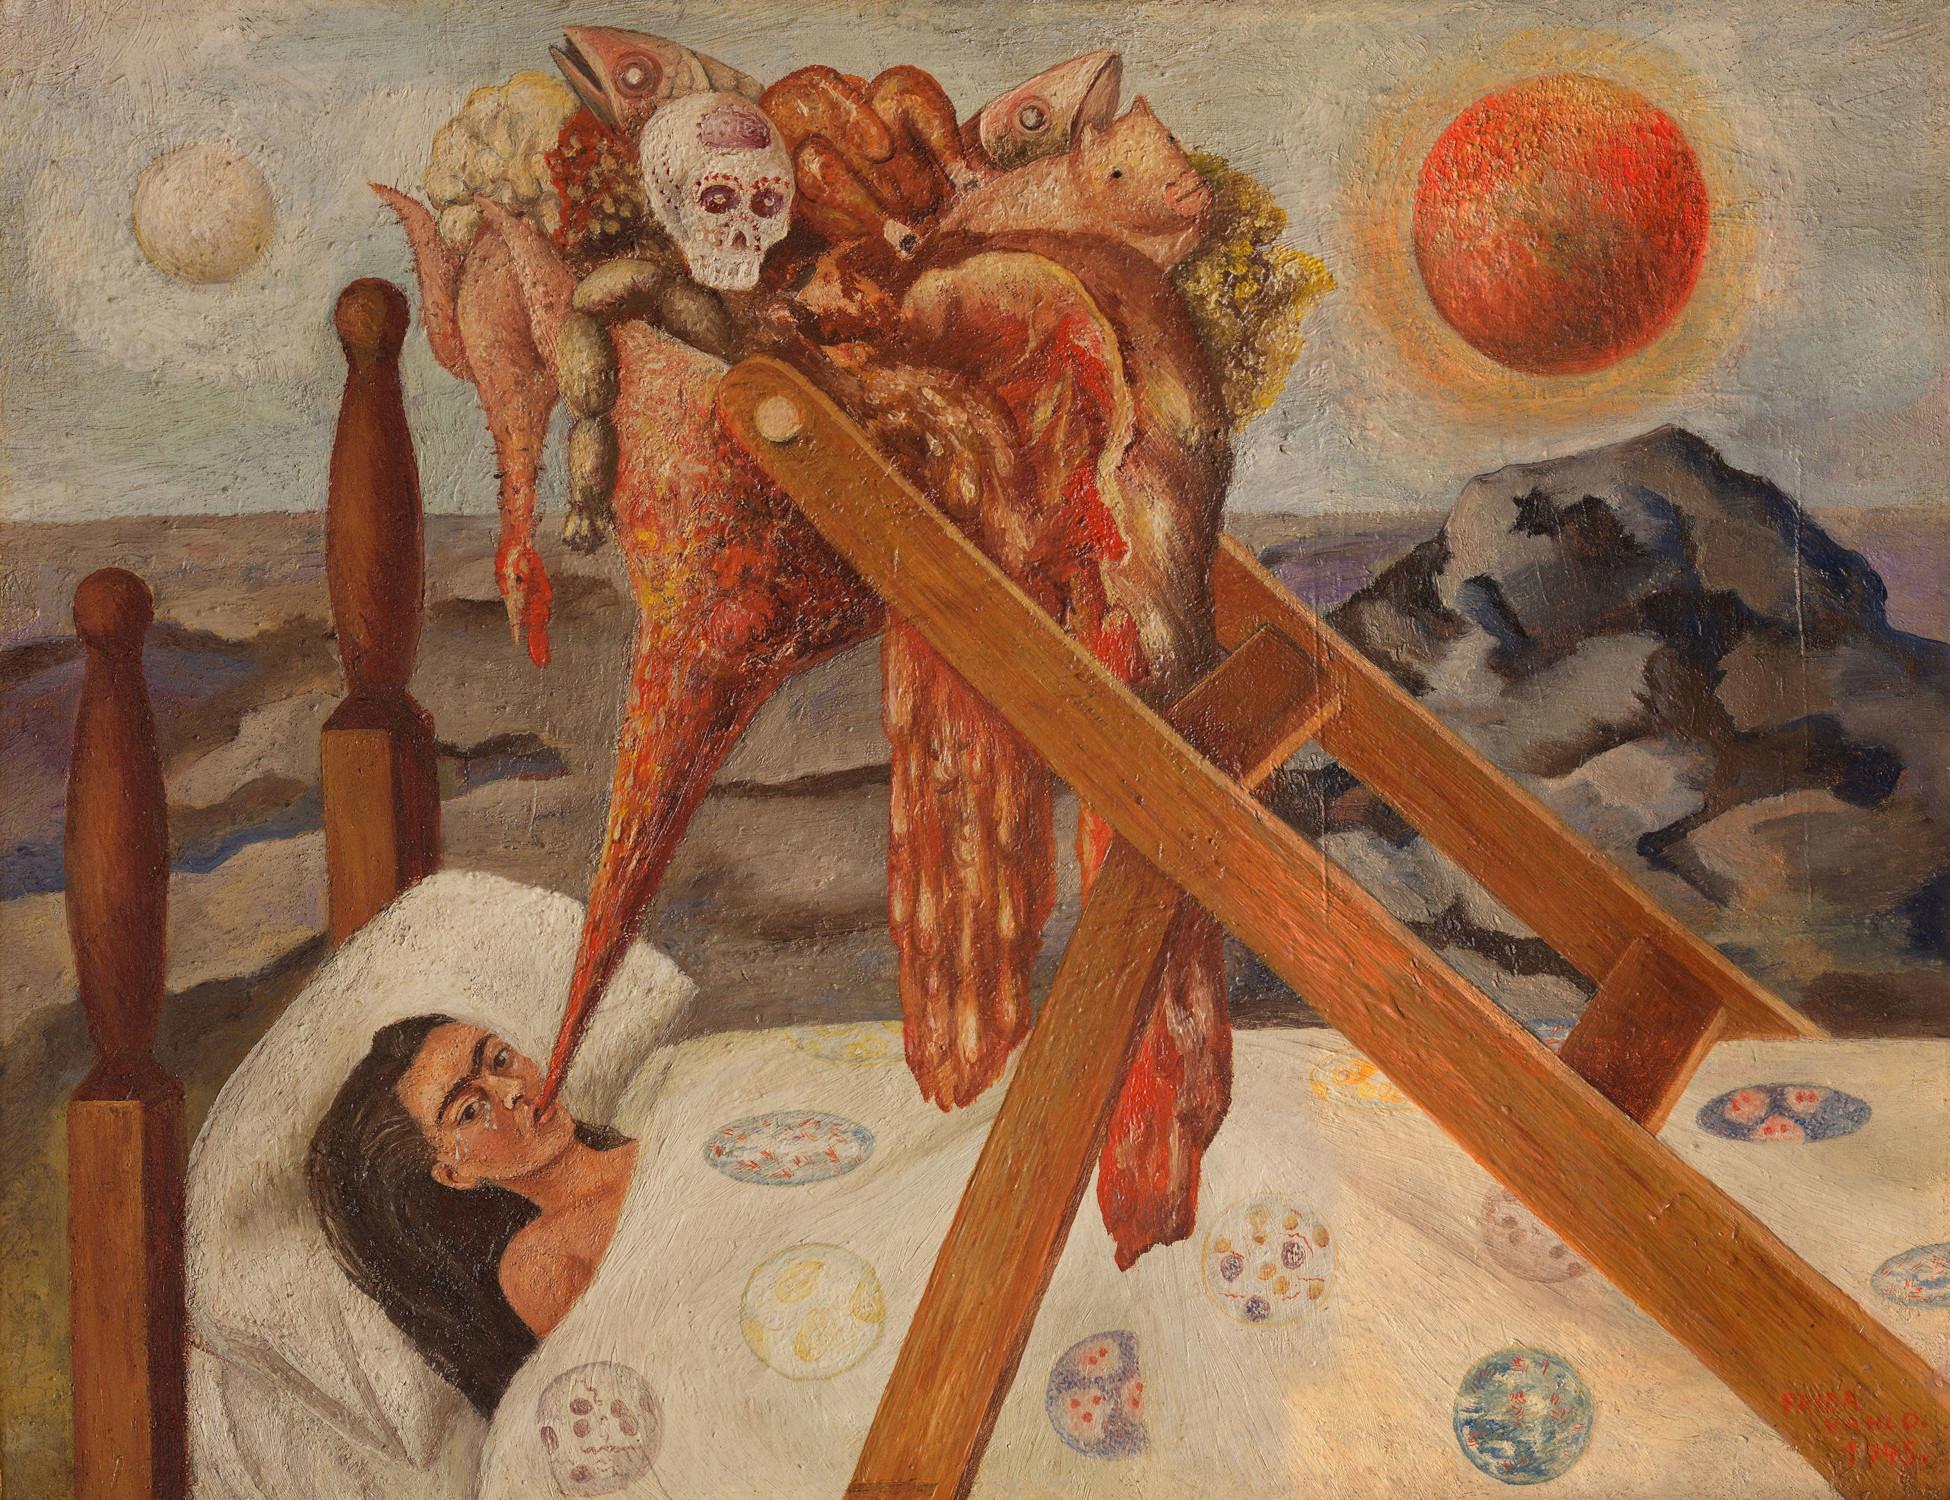 Reményt vesztve, 1945 / Without Hope, 1945 olaj, vászon farostra húzva / oil on canvas, mounted of masonite 28 × 36 cm Col. Museo Dolores Olmedo, Xochimilco, México Fotó: ©Erik Meza/Javier Otaola – ©Archivo Museo Dolores Olmedo